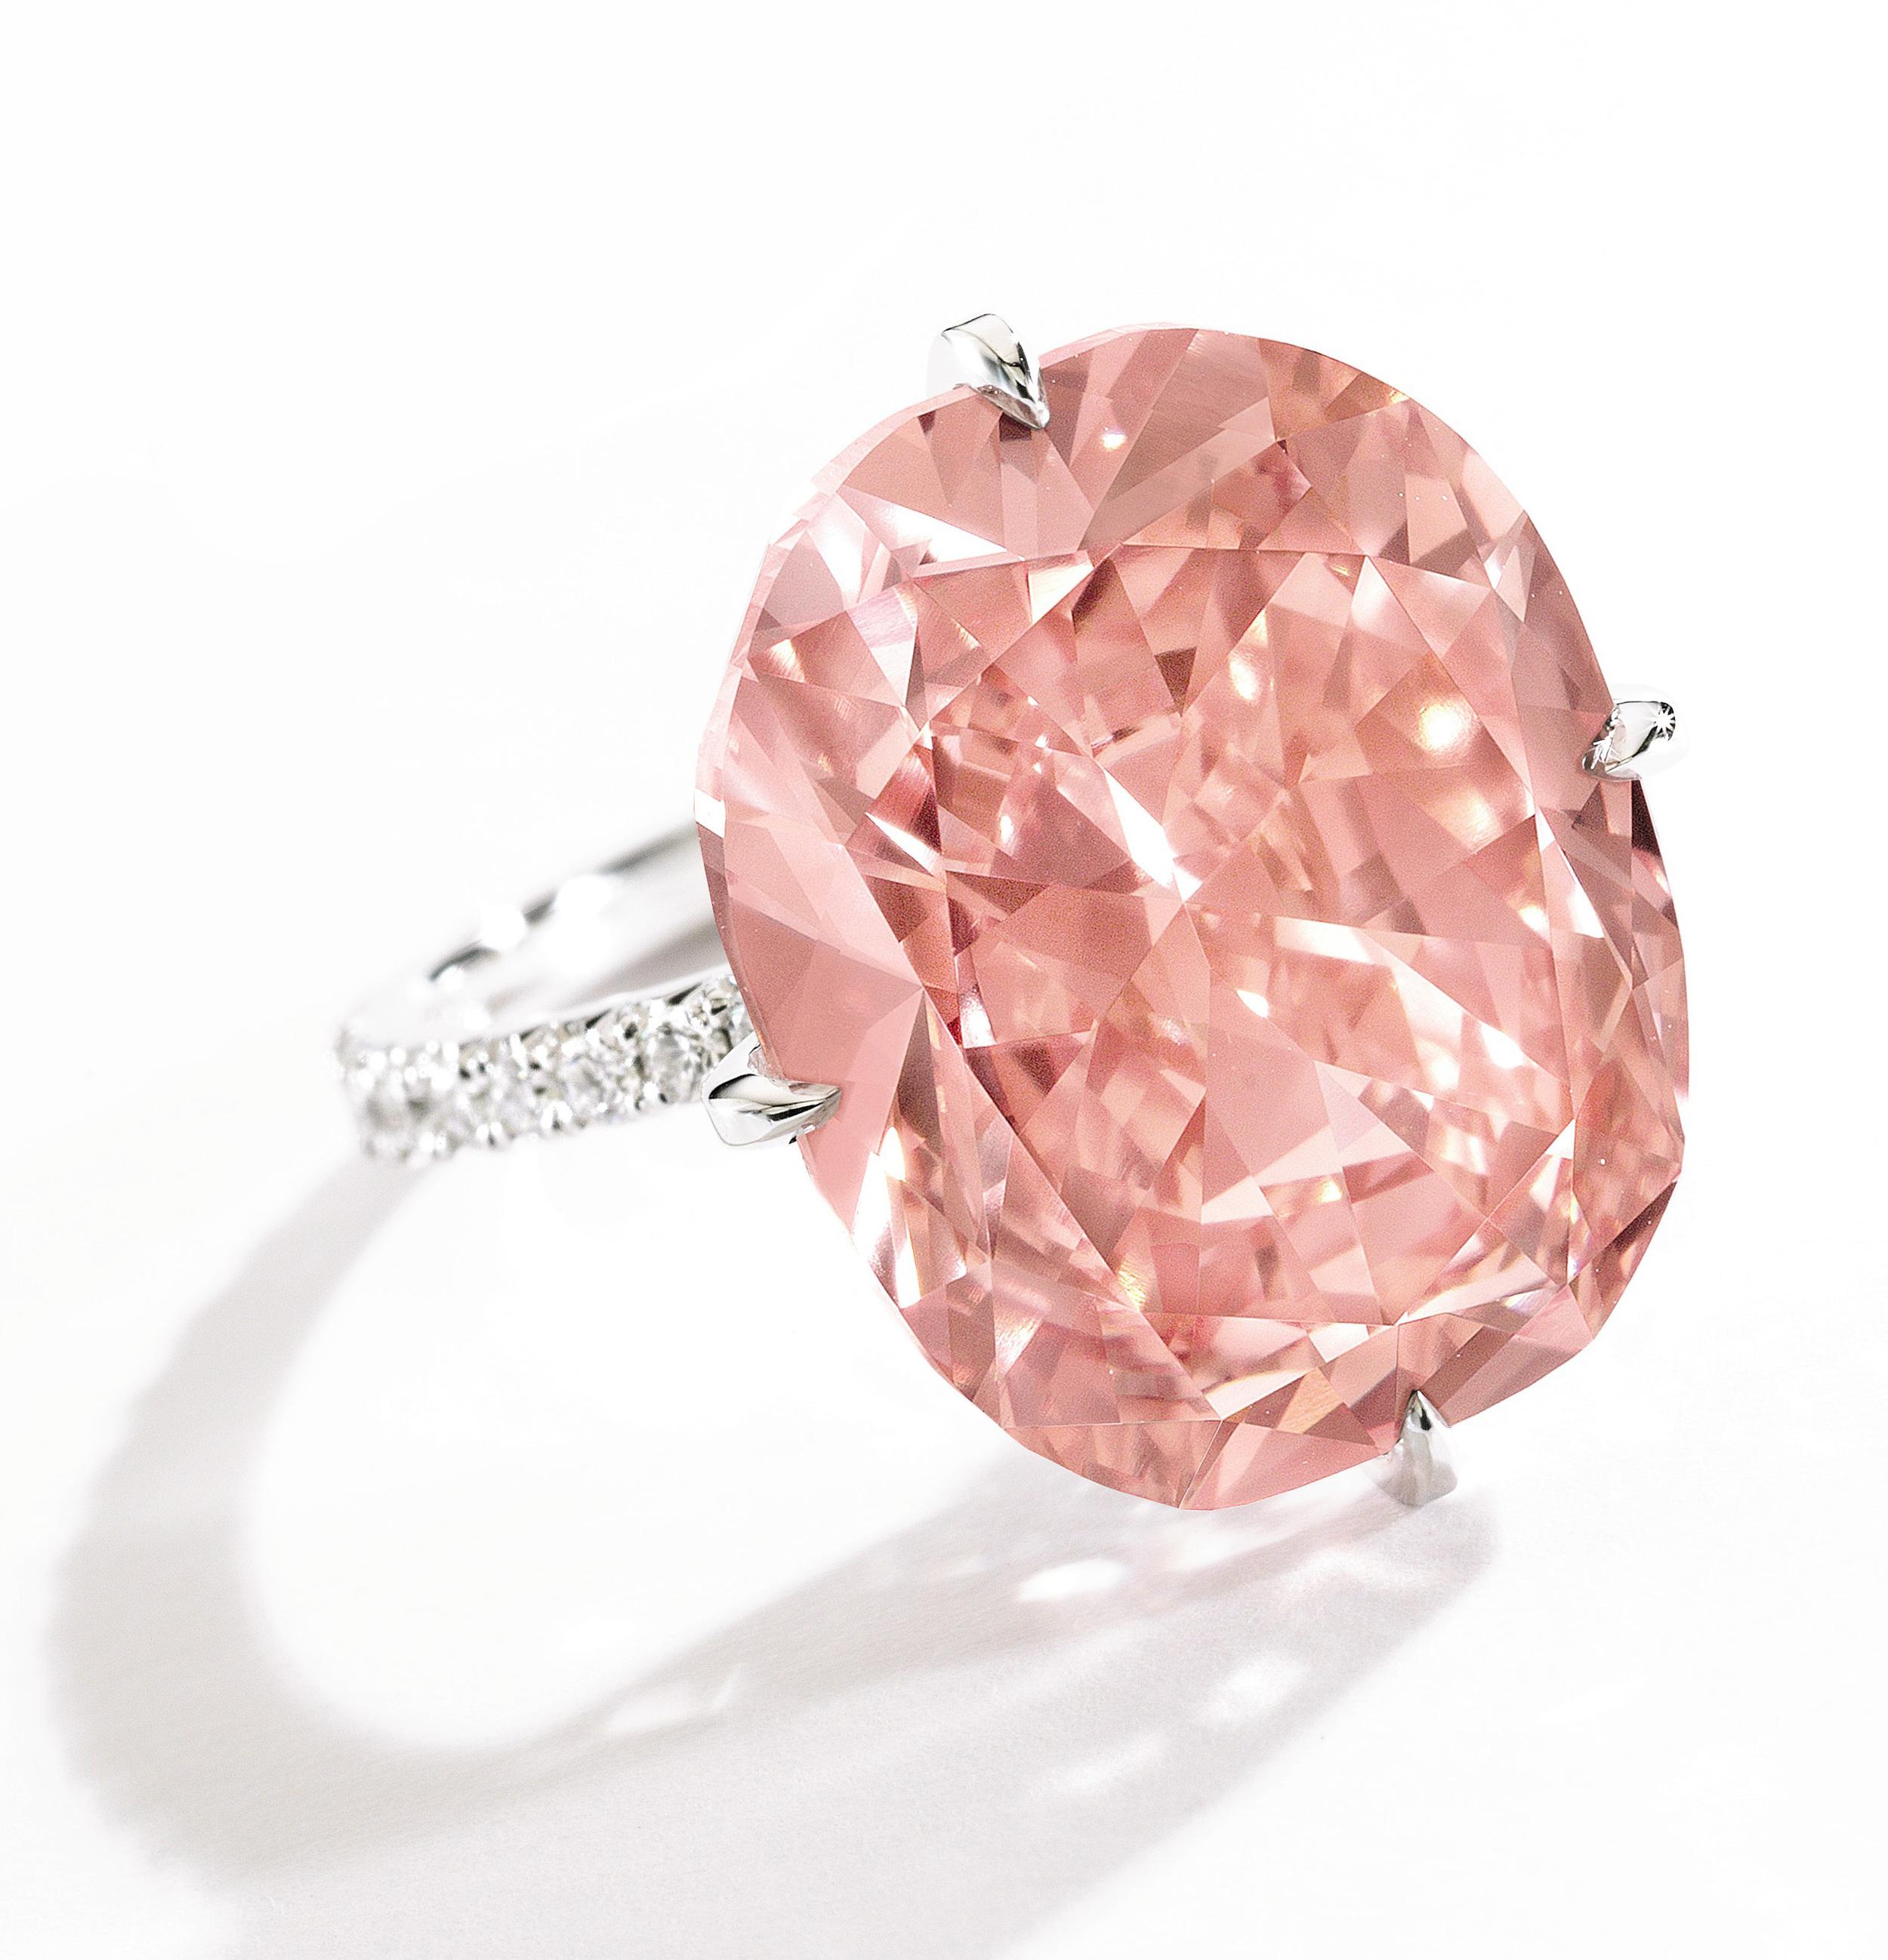 4ct Pink Diamond